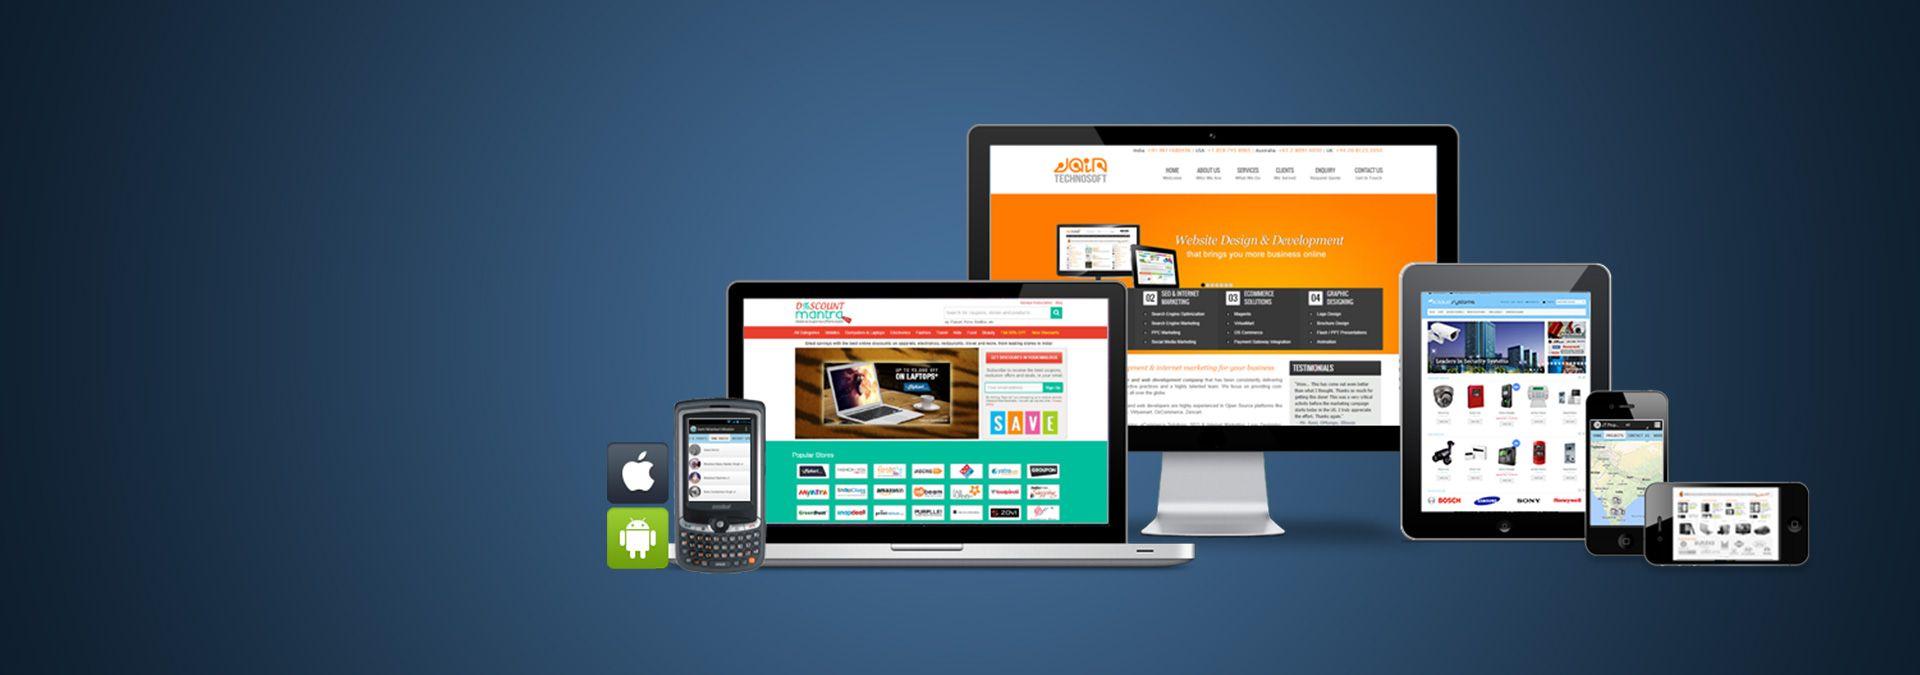 Benefits Of Using Web Templates For Building Your Website Web Design Training Web Design Course Web Development Design